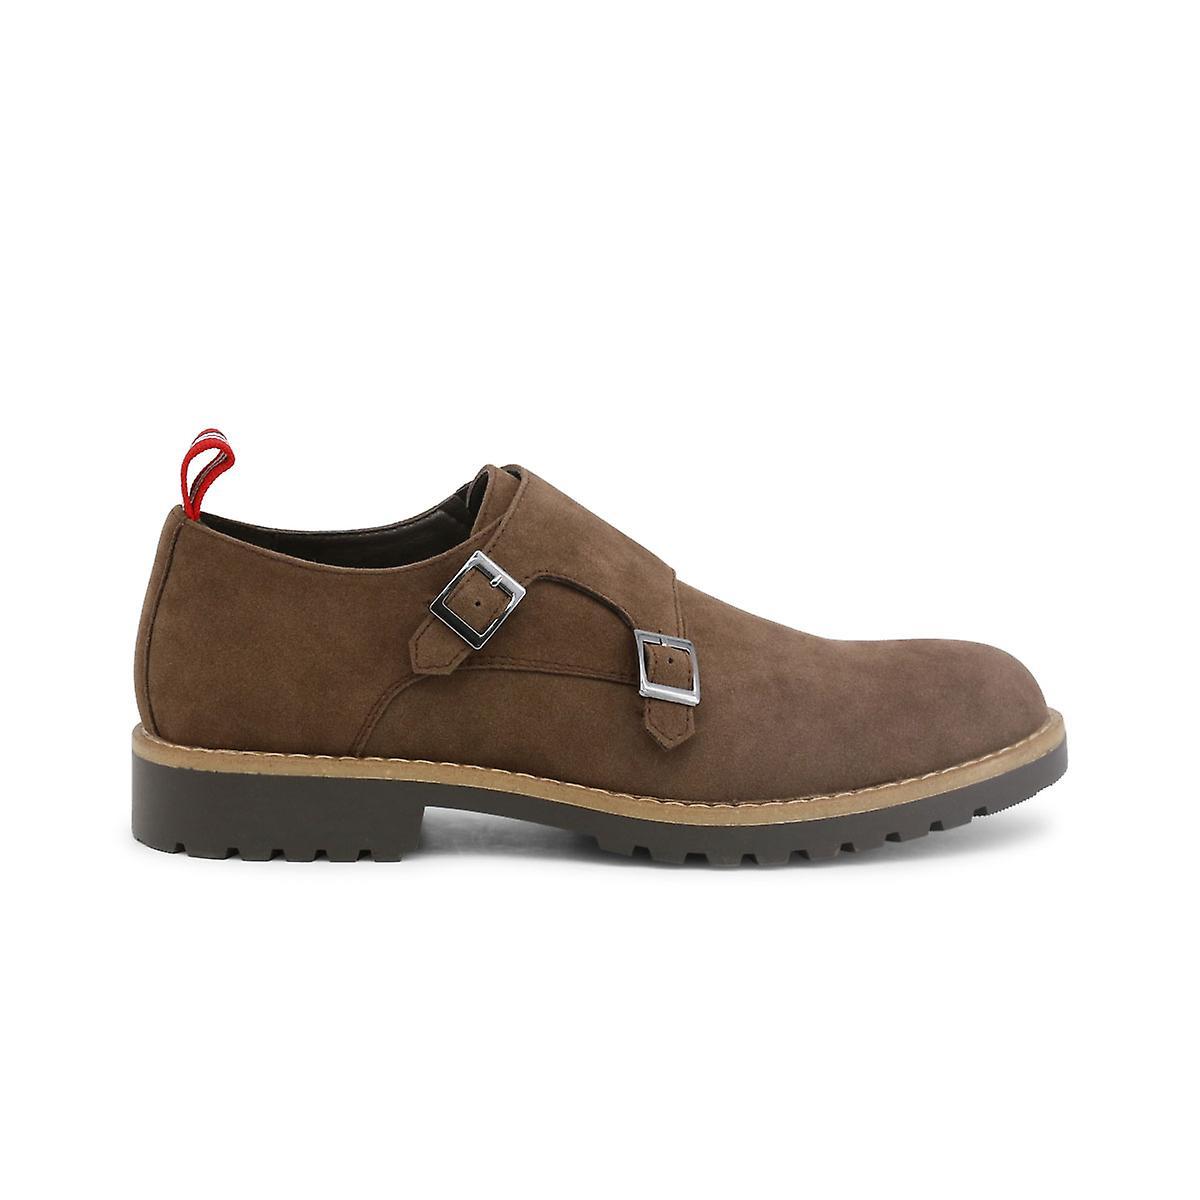 Duca di Morrone Original Men Automne/Winter Flat Shoe - Brown Color 30383